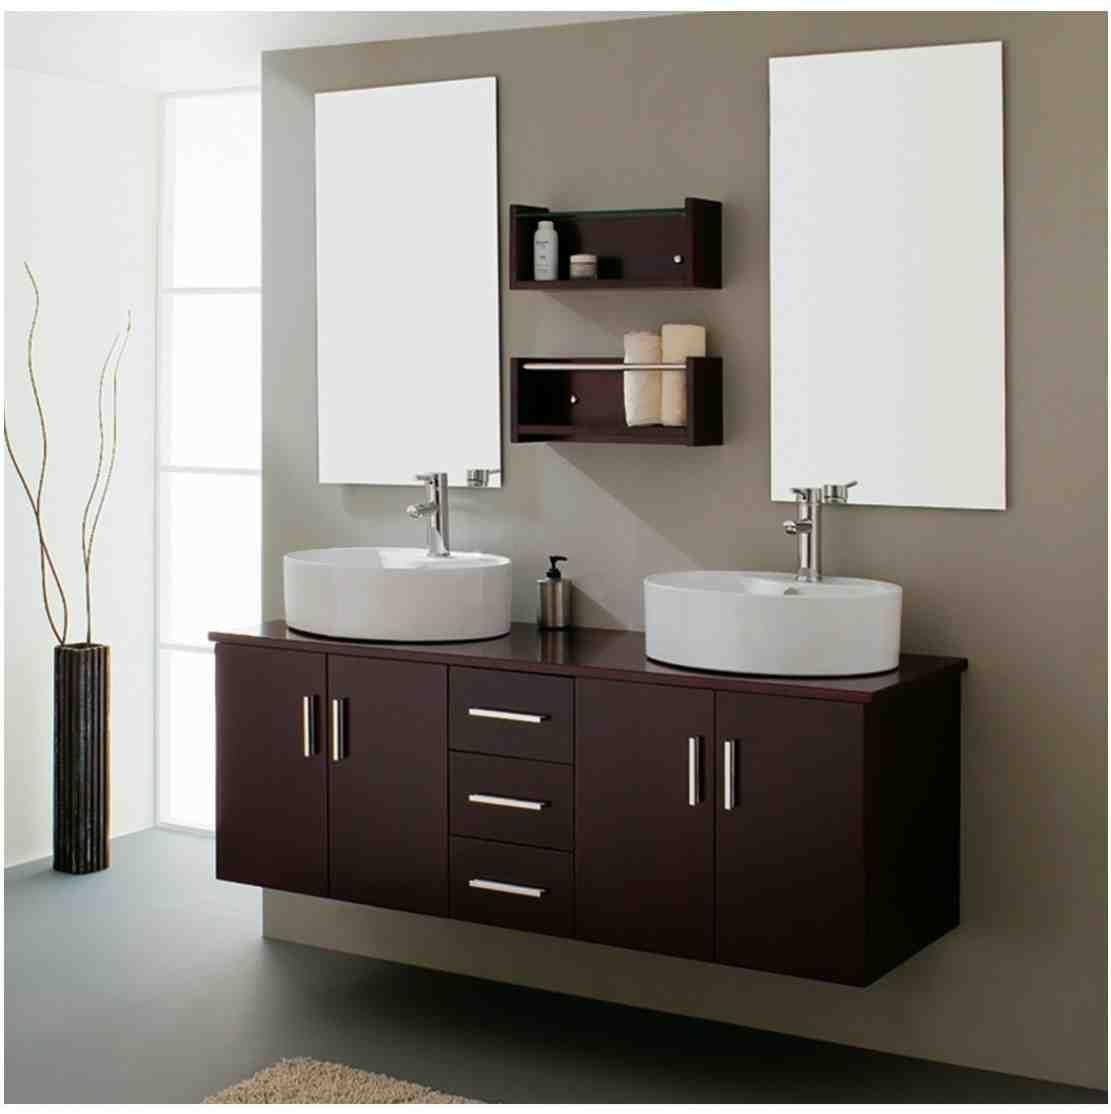 bathroom cabinets bathroom vanity designs black vanity on ikea bathroom vanities id=70994